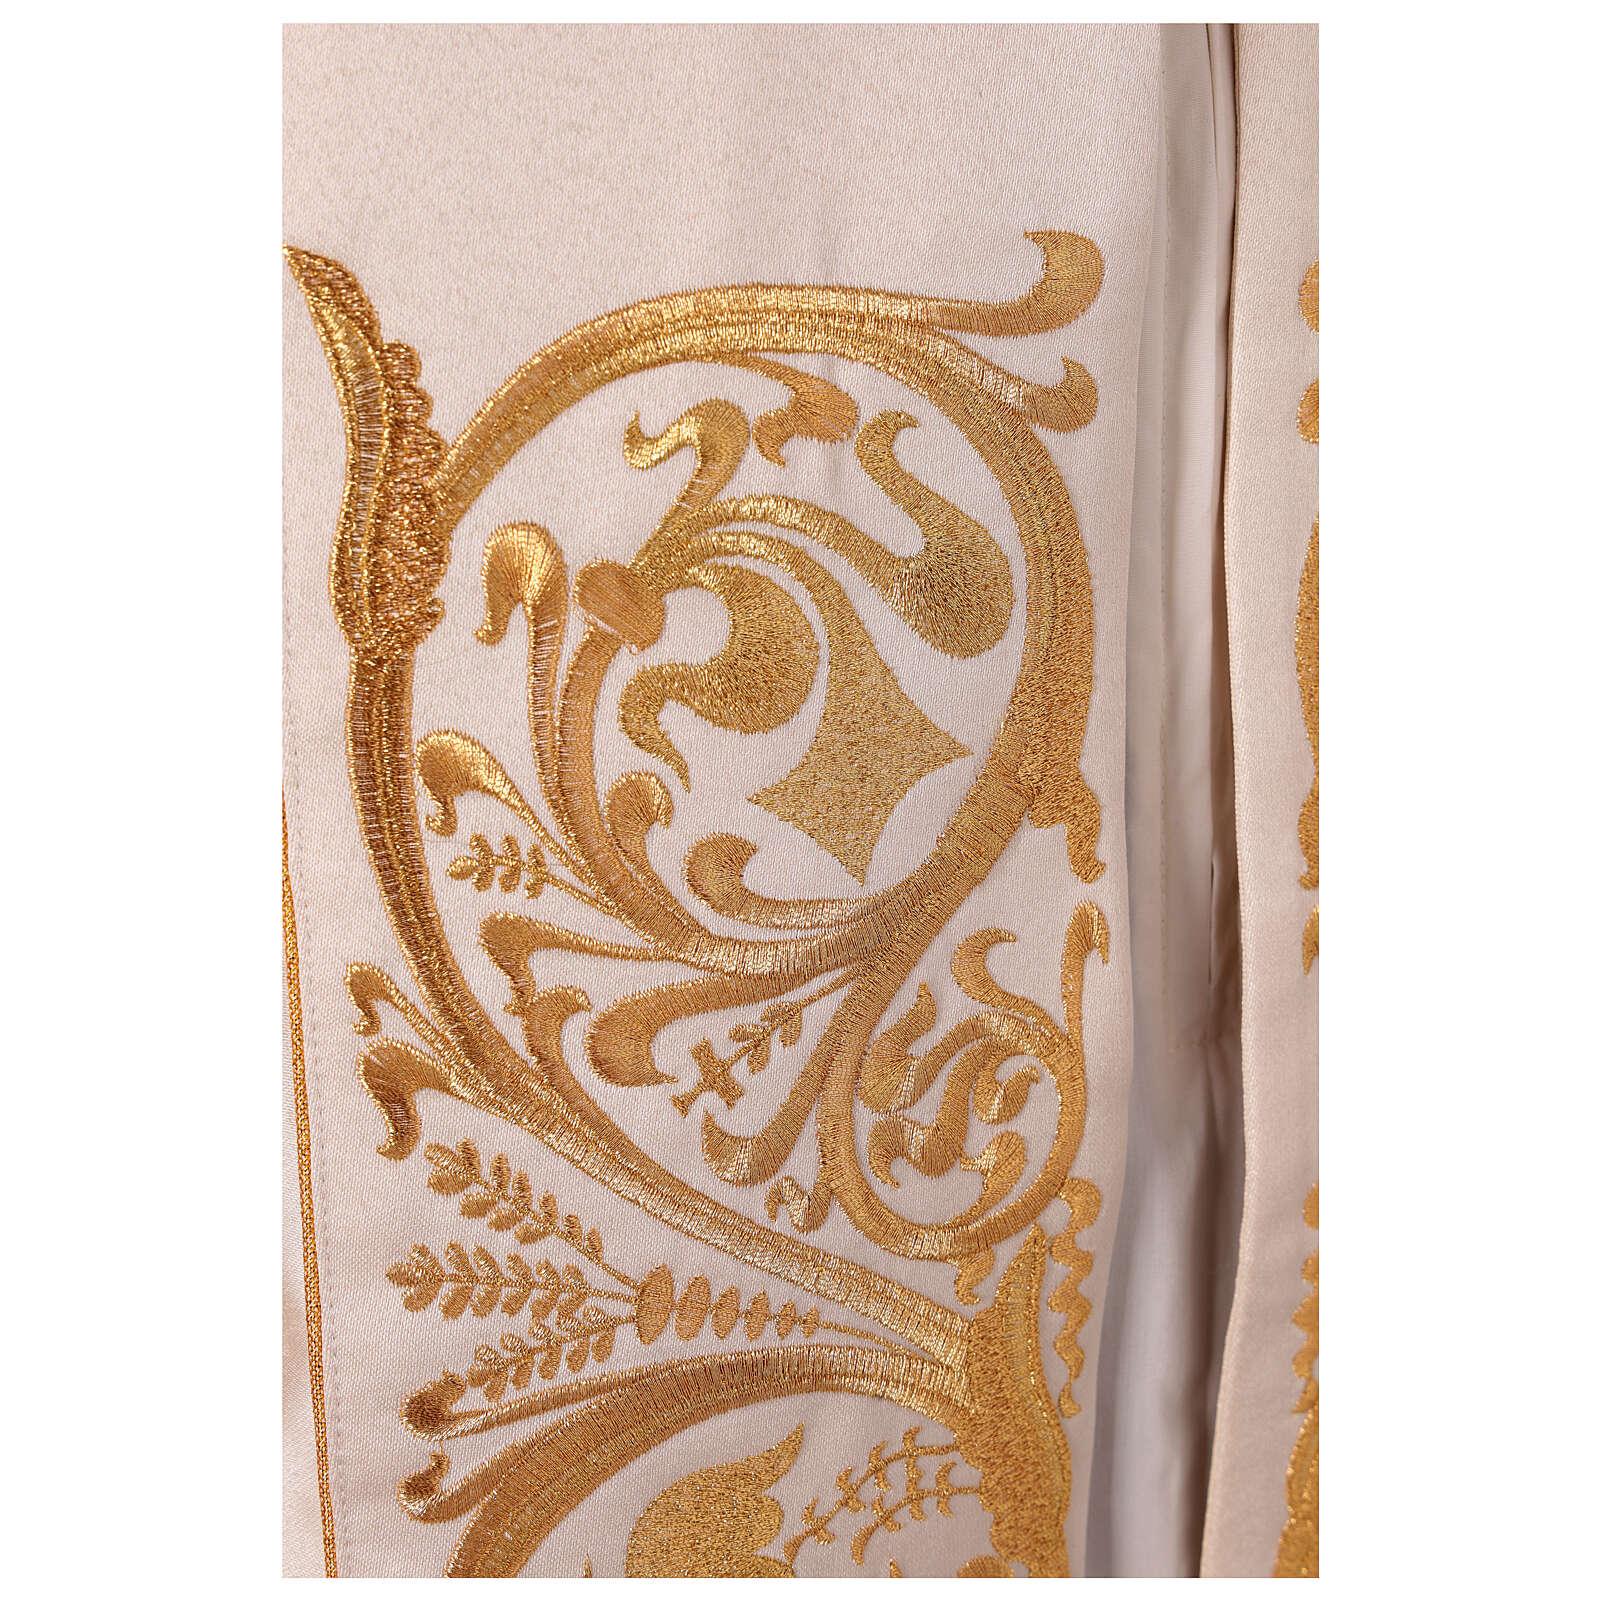 Piviale 80% poliestere bianco panna finiture dorate floreali JHS 4